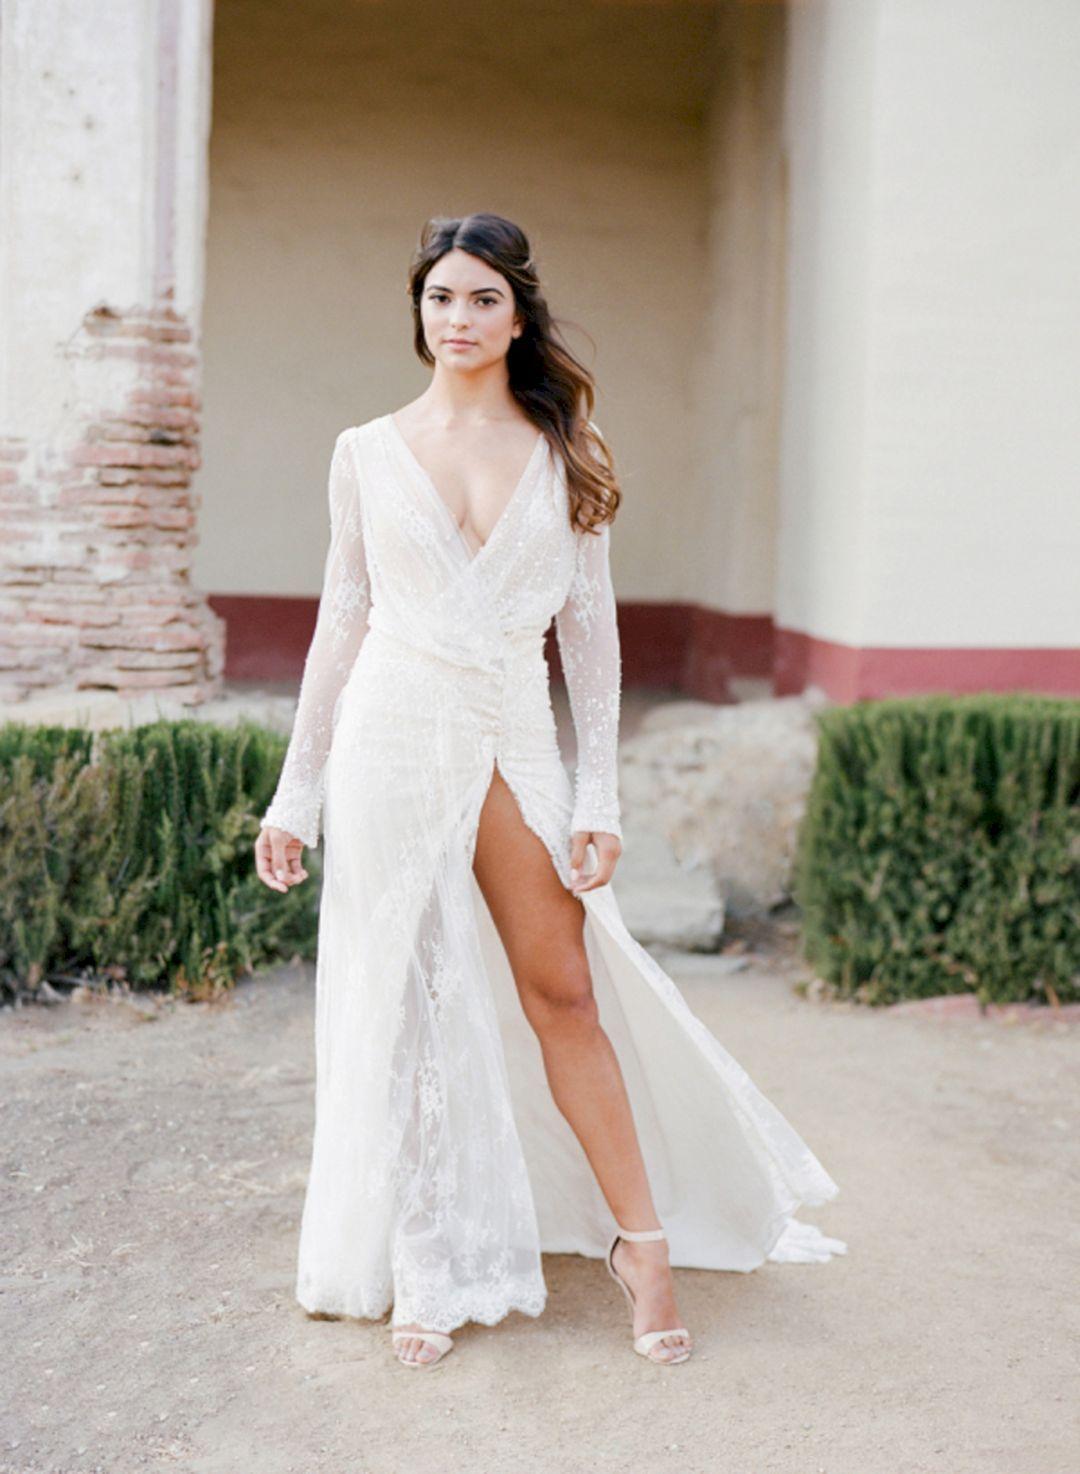 Nice wedding dresses   Inbal Dror Wedding Gown Design For Bridal Looks More Pretty